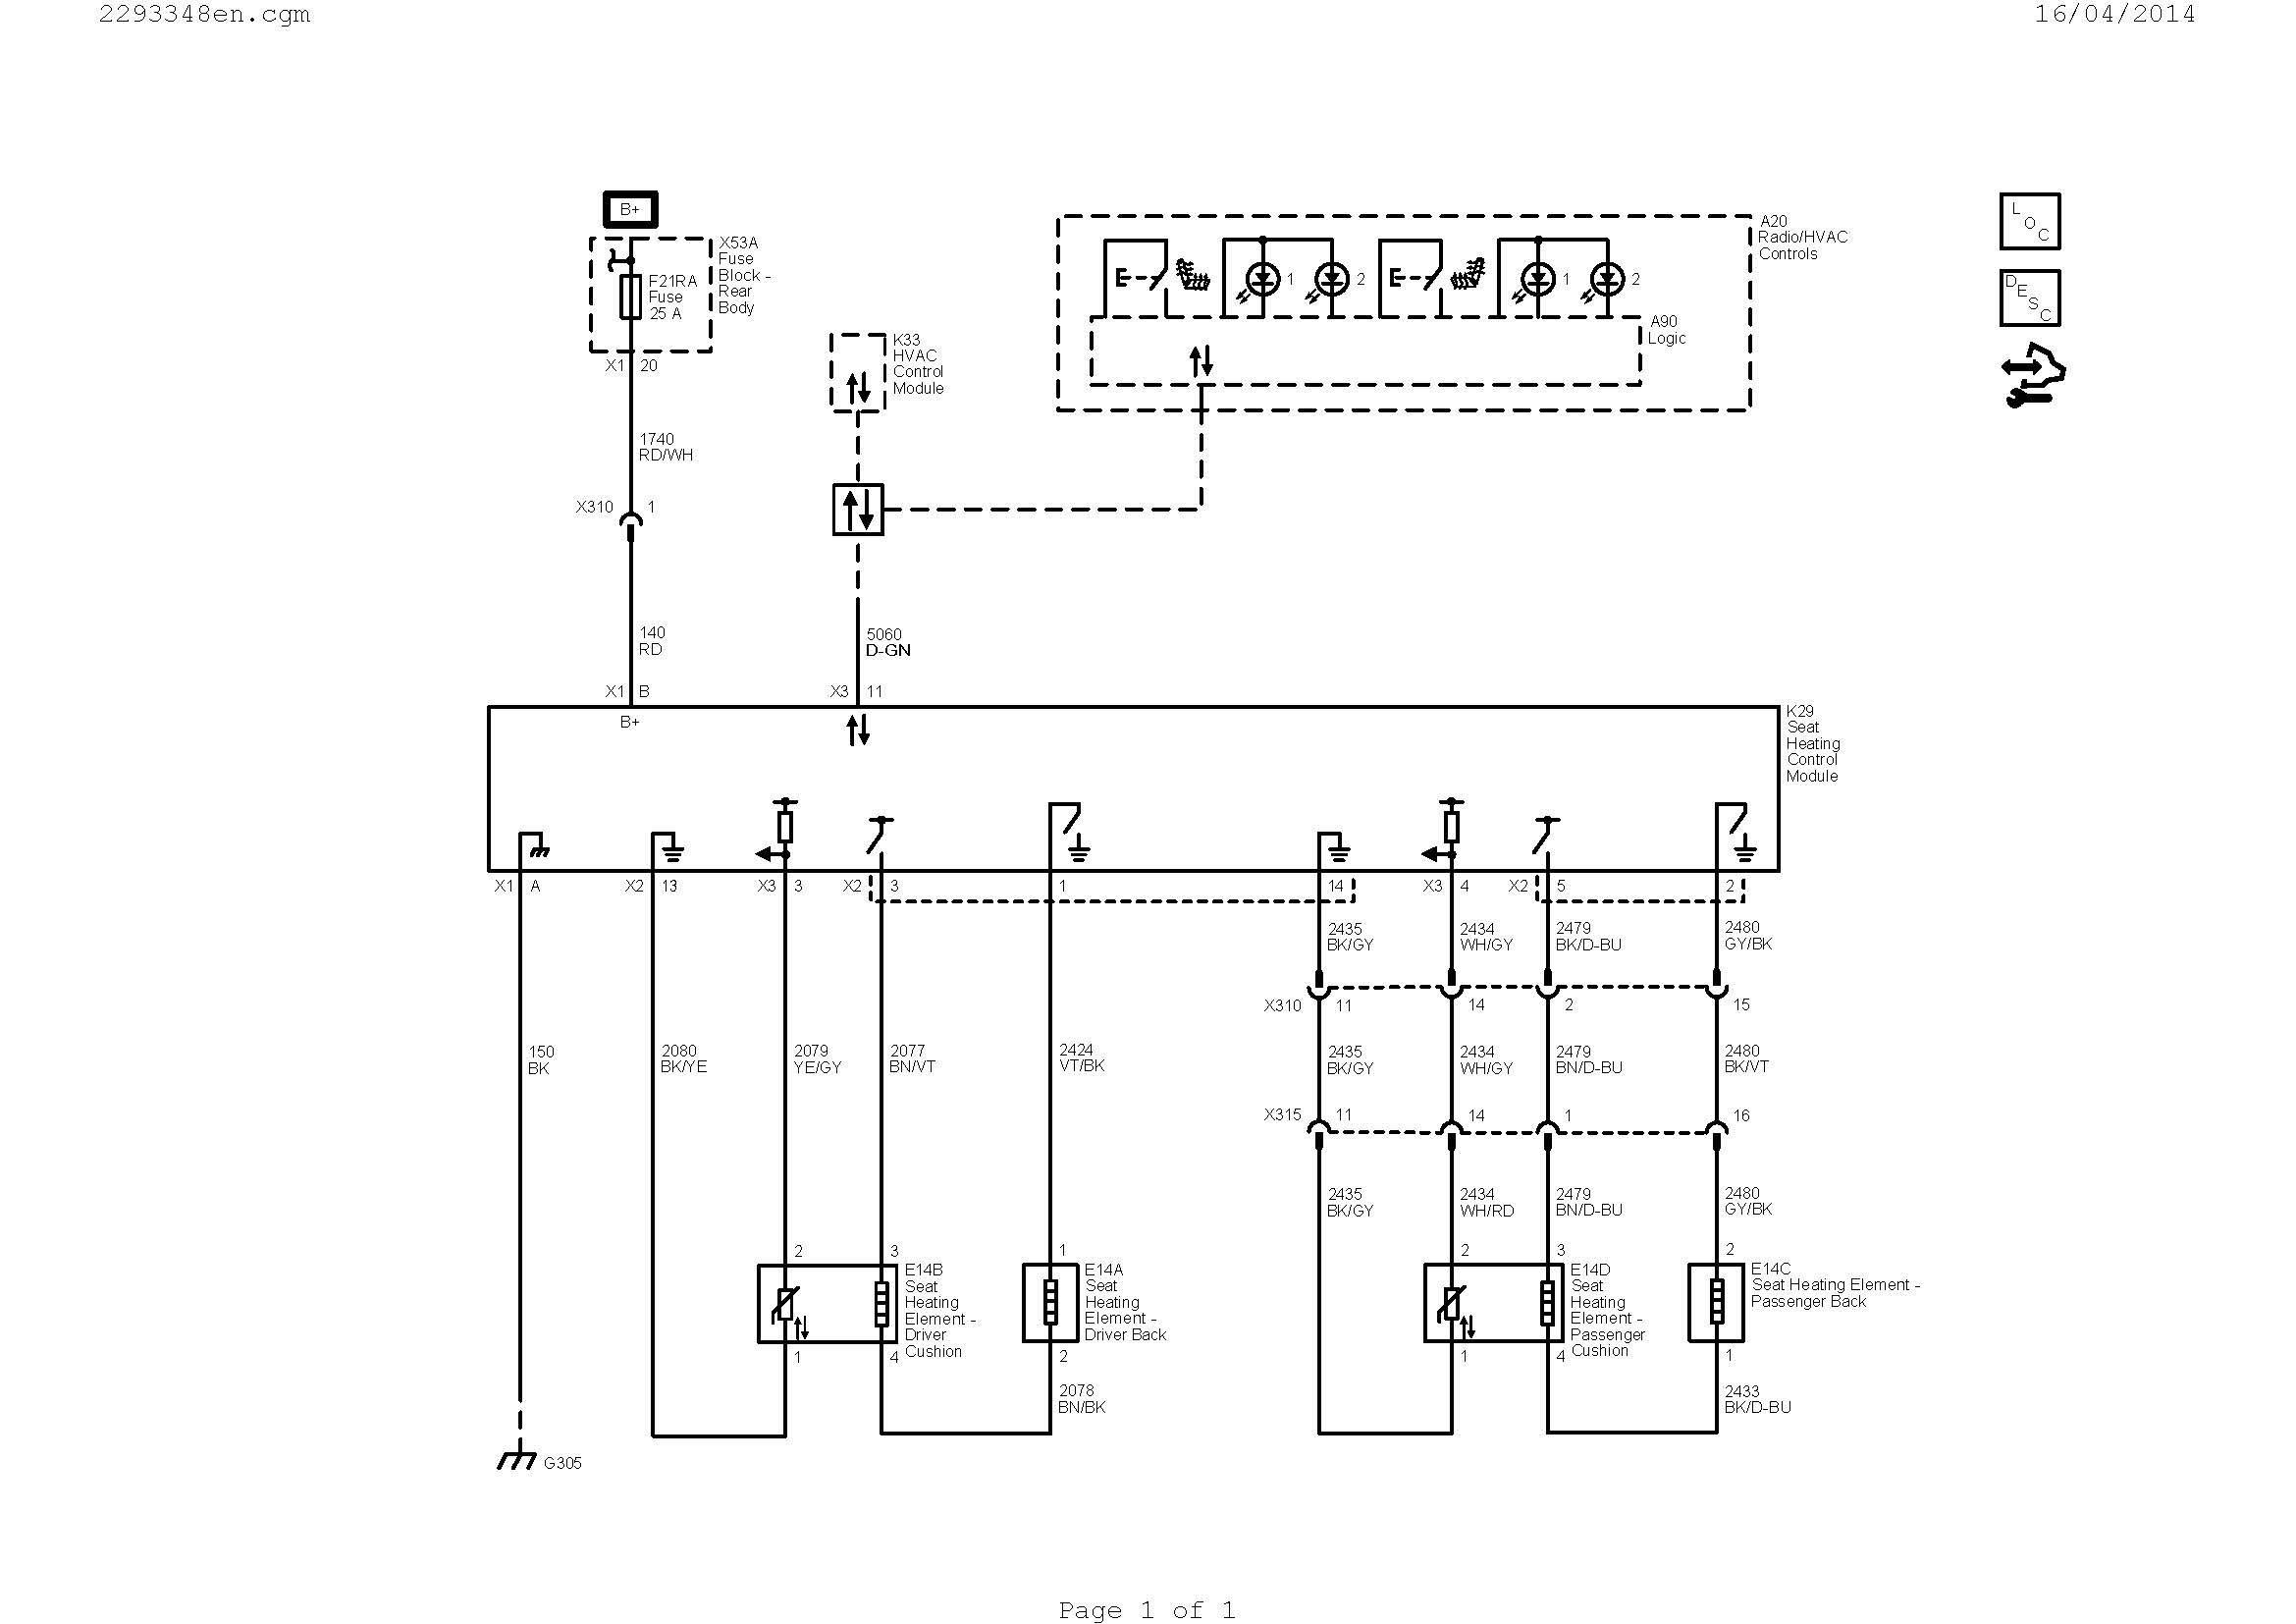 furnace wiring diagram Collection-Furnace Parts Diagram New Hvac Diagram Best Hvac Diagram 0d – Wire Diagram 6-b